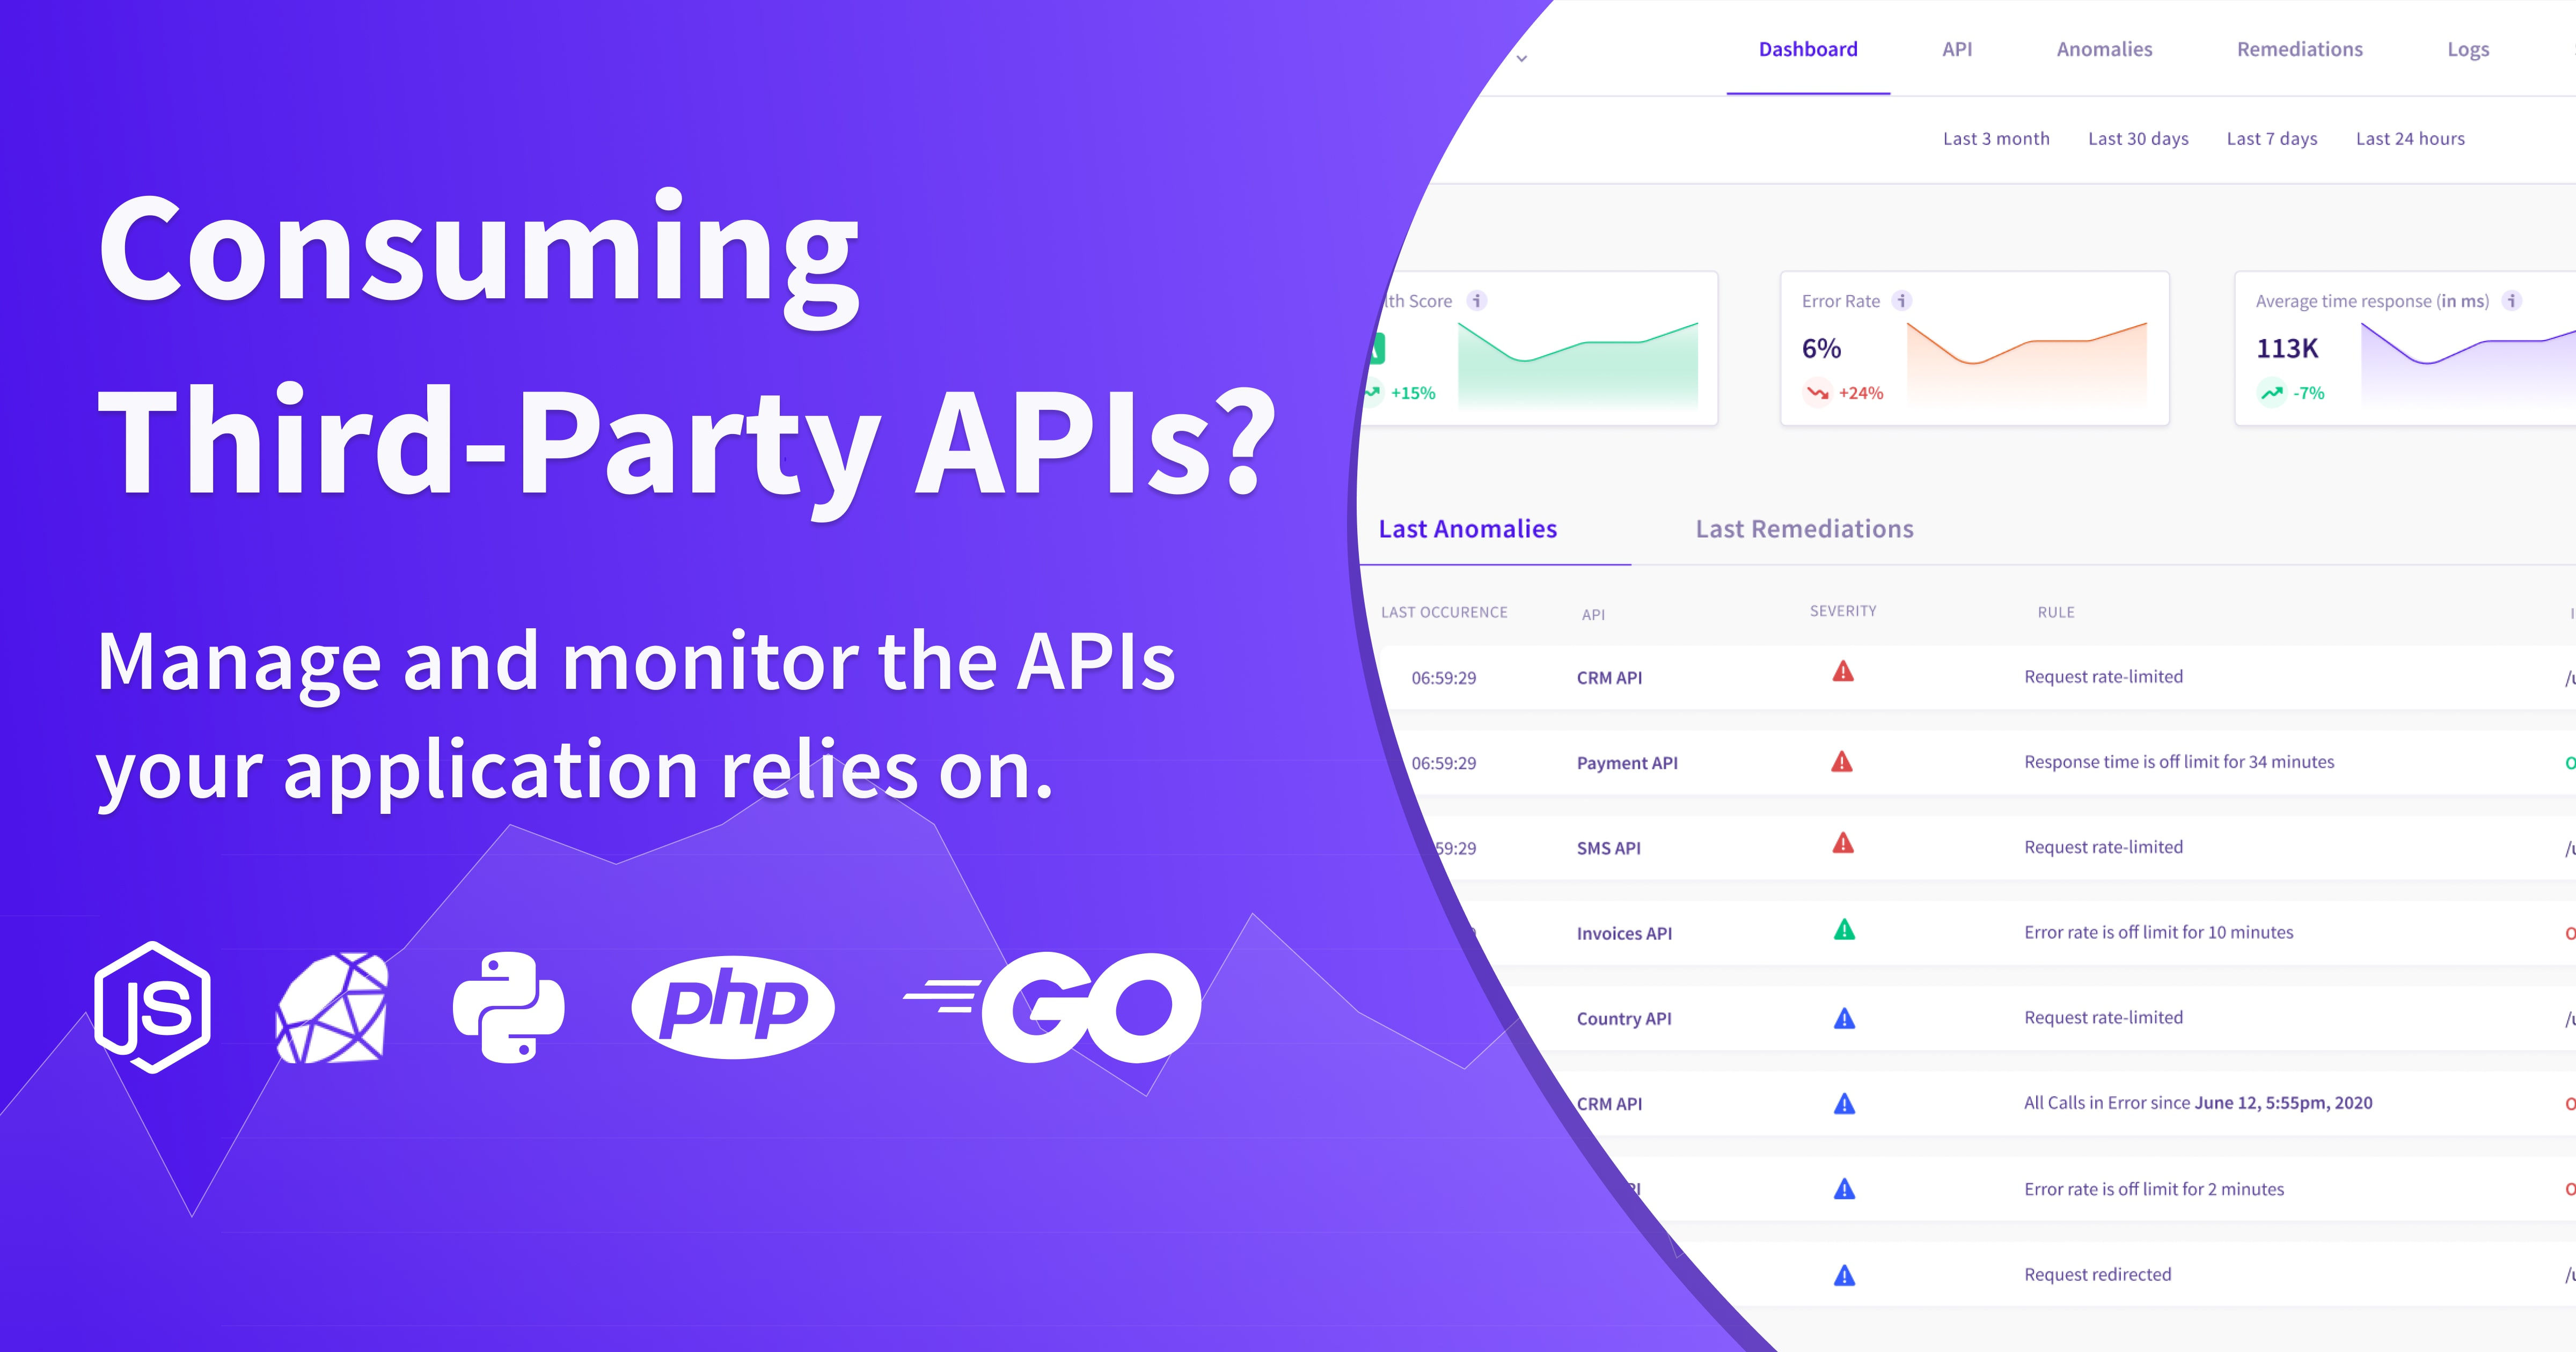 API Monitoring: Manage and Monitor Third-Party APIs ...